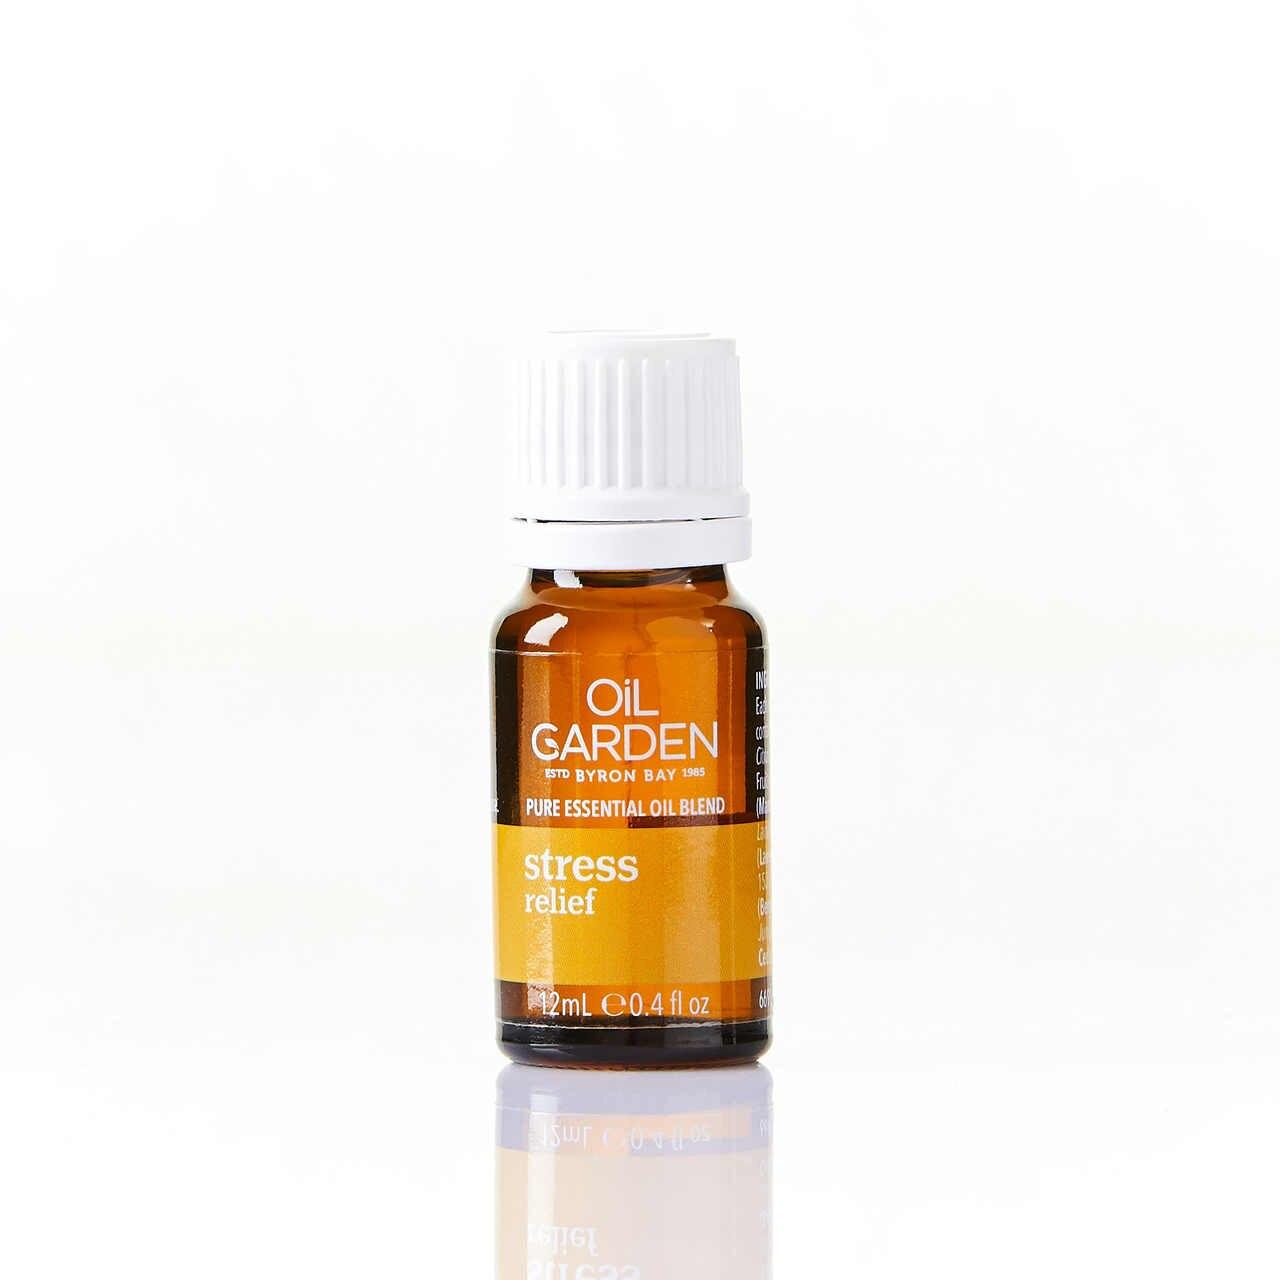 Oil Garden Stress Relief Essential Oil Blend 12mL 6691348